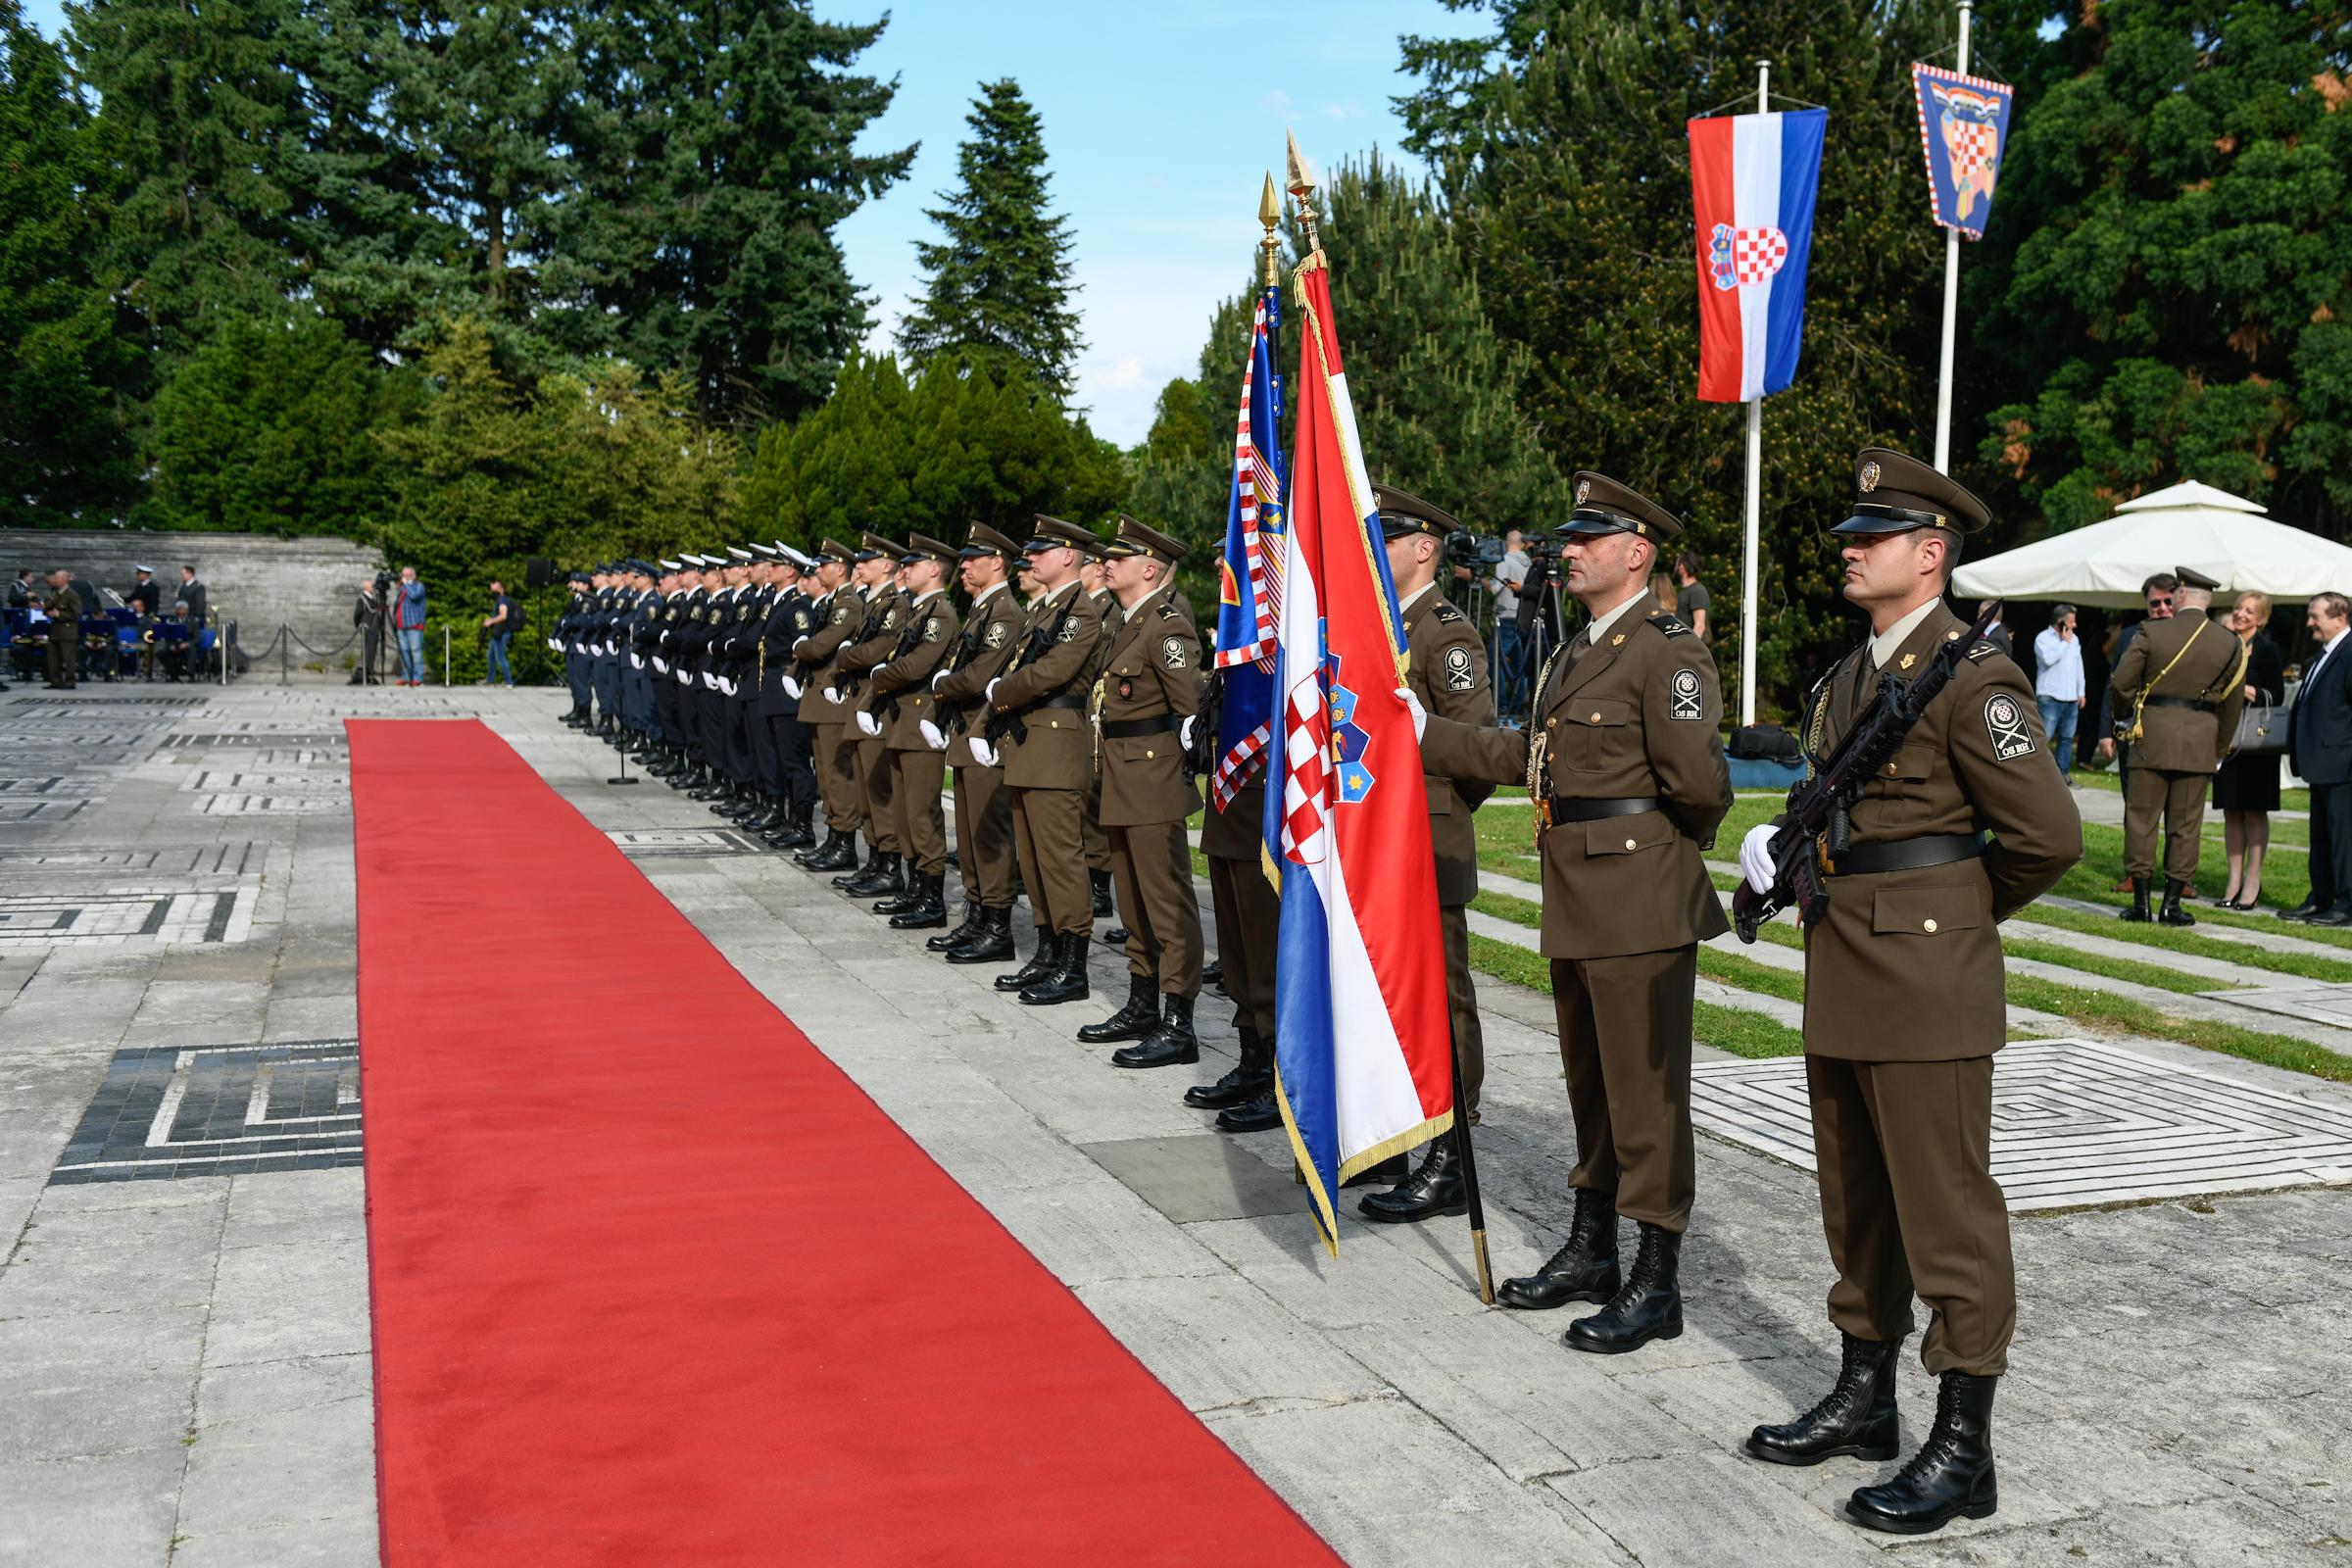 Ministar Banožić i admiral Hranj na prijemu povodom Dana Hrvatske vojske